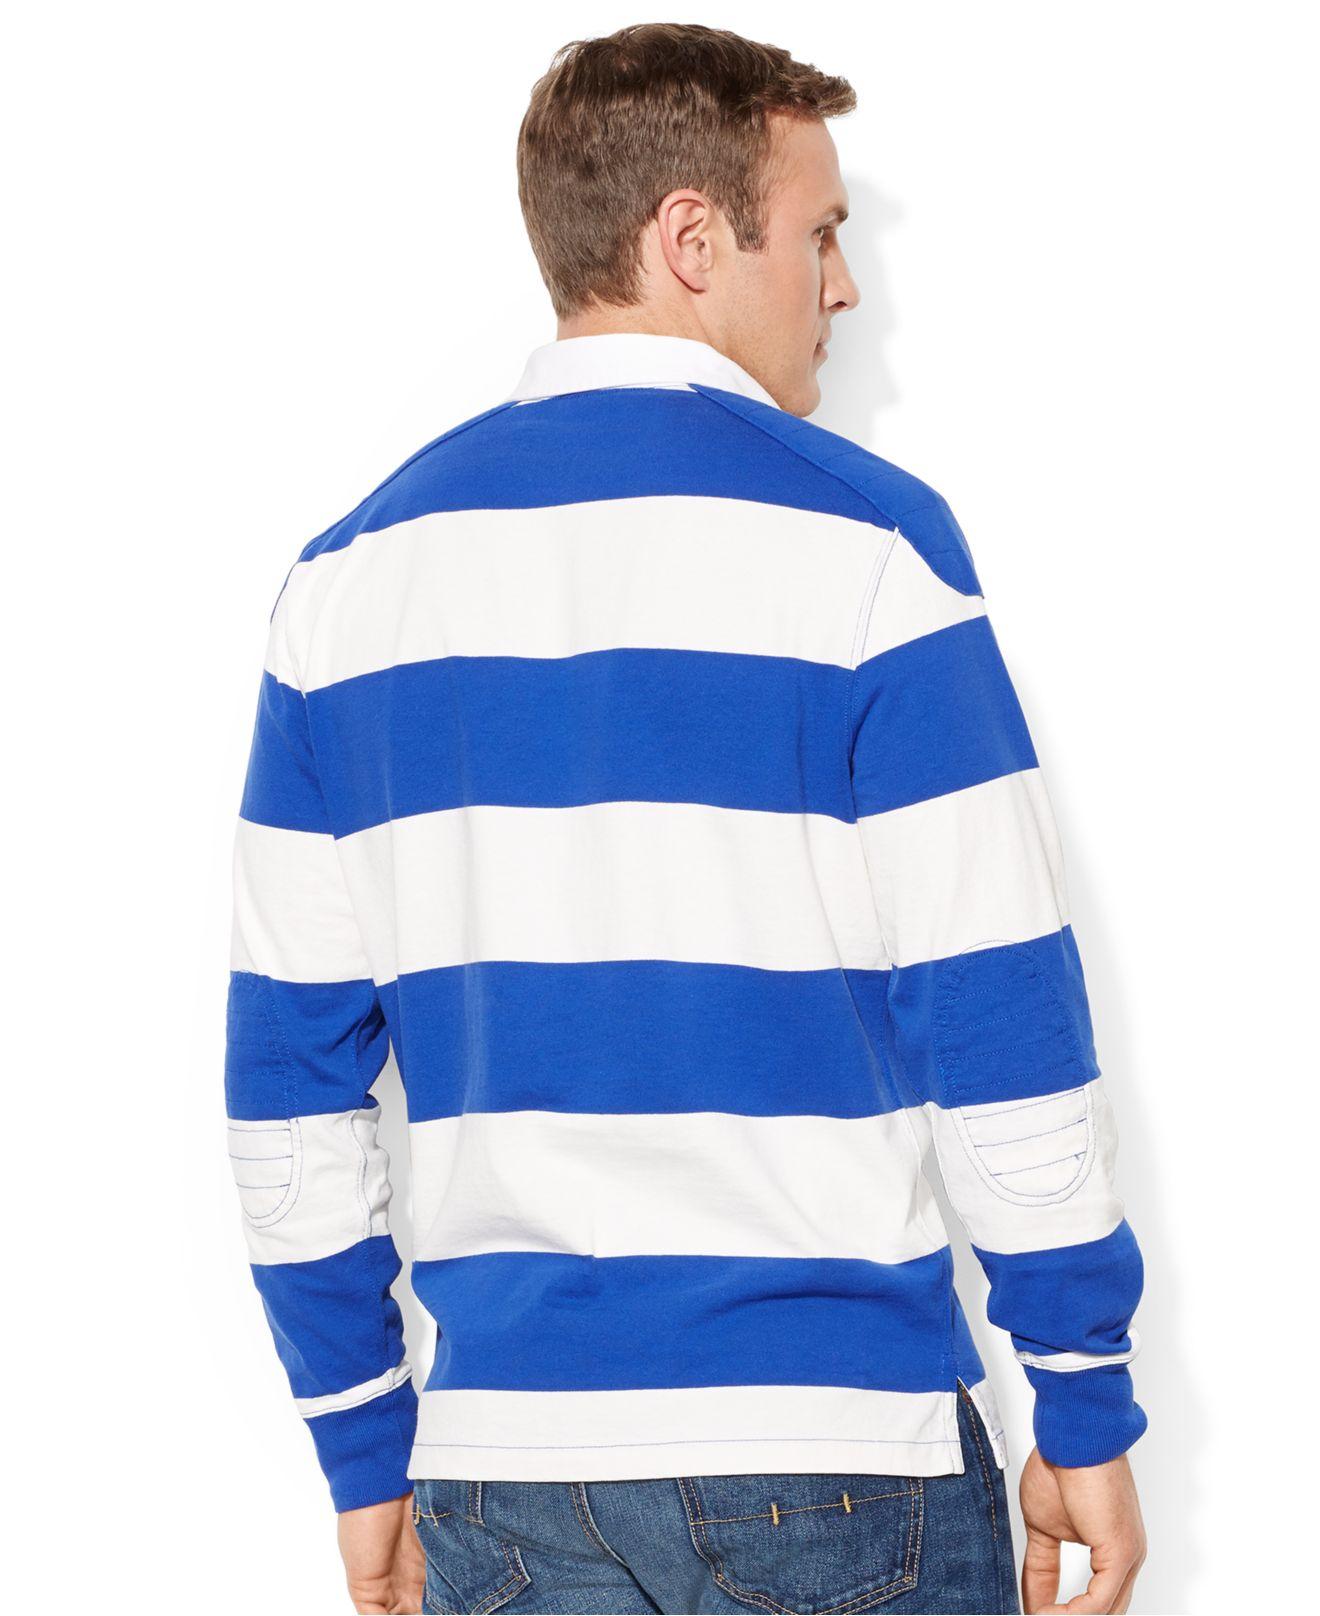 Polo ralph lauren big and tall long sleeve stripe rugby for Long sleeve striped rugby shirt